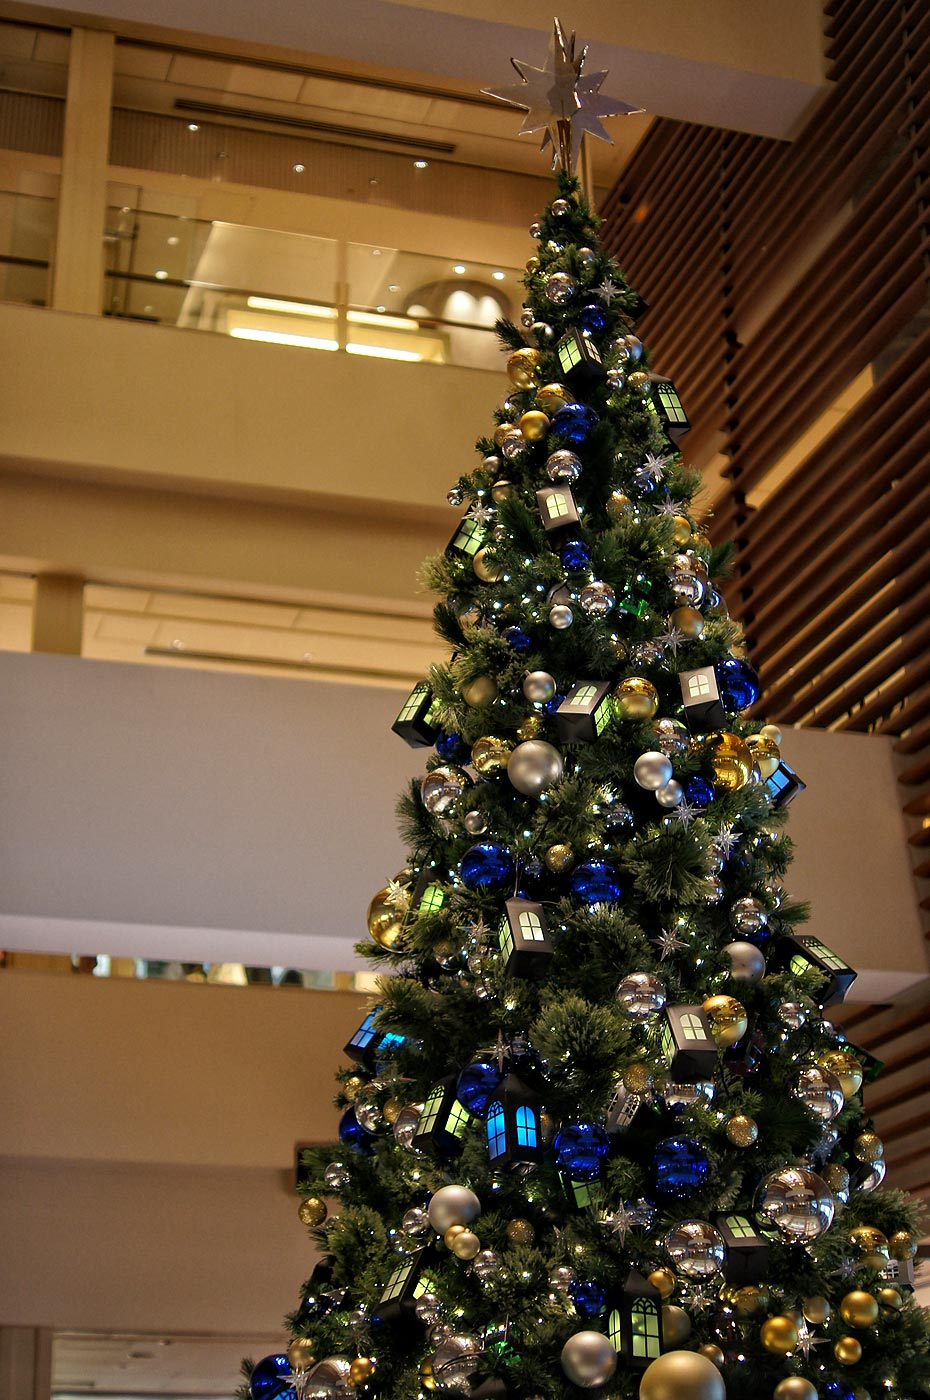 Christmas tree_e0216133_0121034.jpg